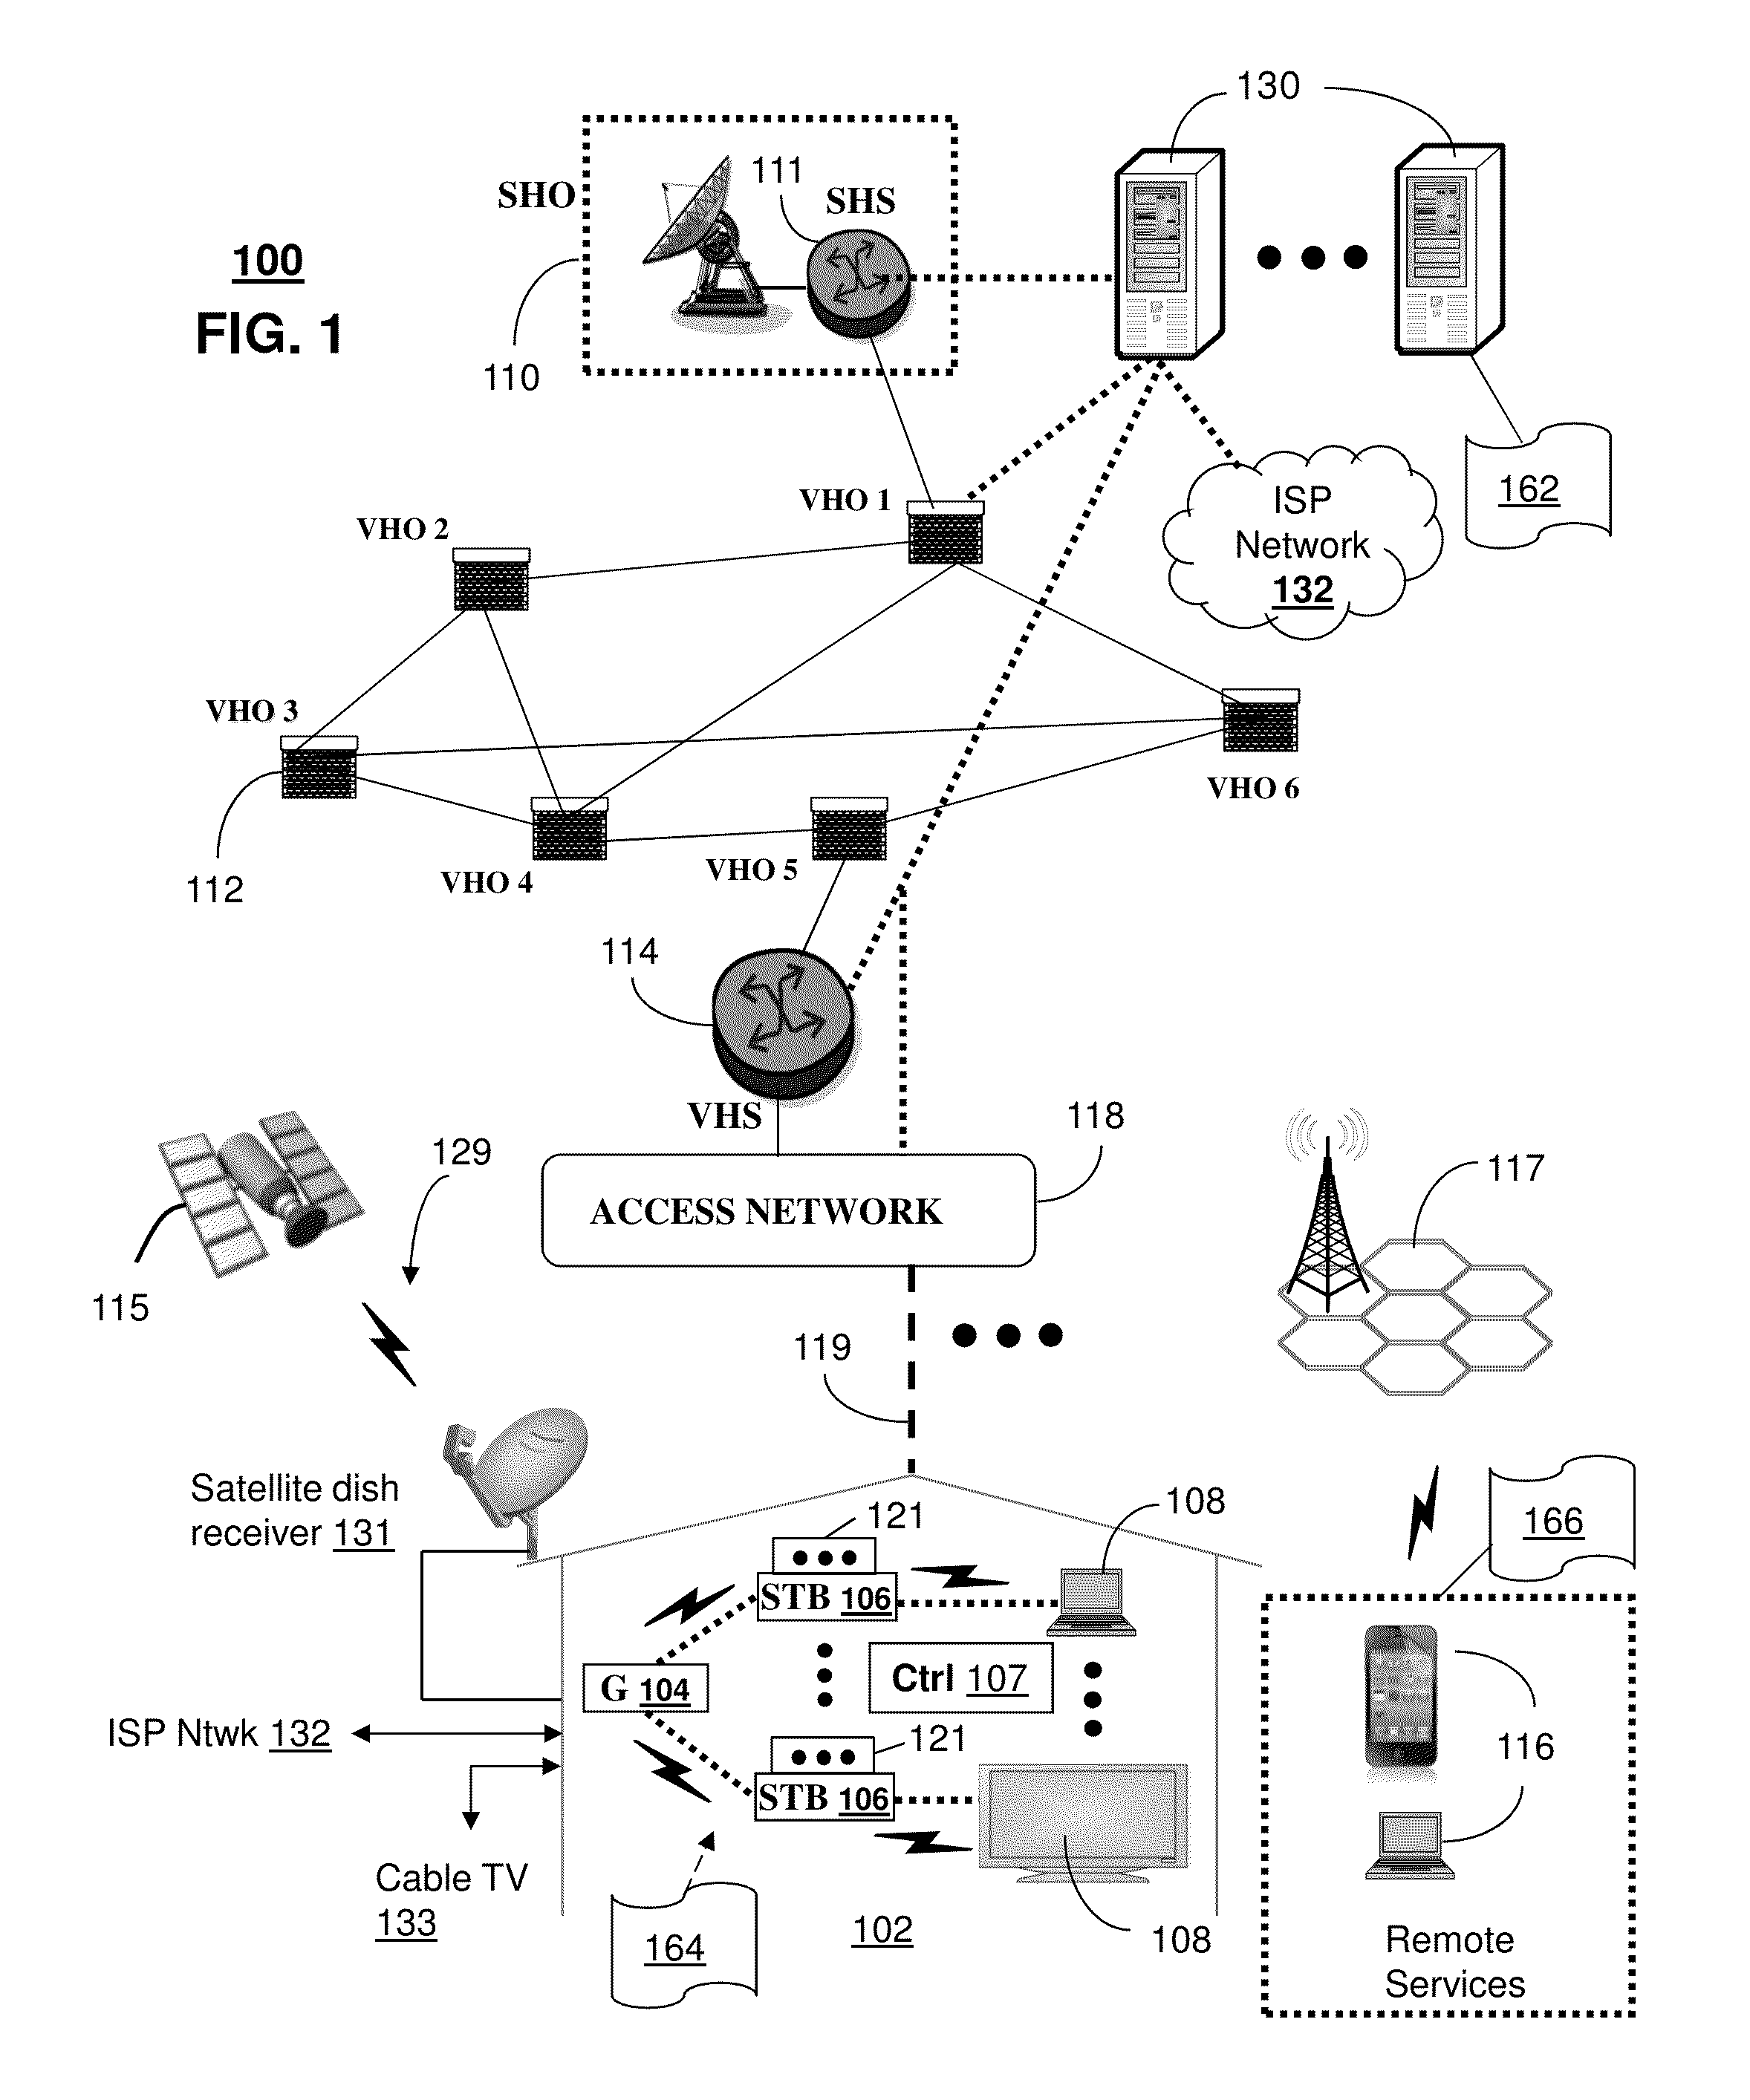 hdmi to rca diagram wiring diagram database Powercon Wiring Diagram hdmi spdif diagram wiring diagram database hdmi wiring diagram hdmi to rca diagram